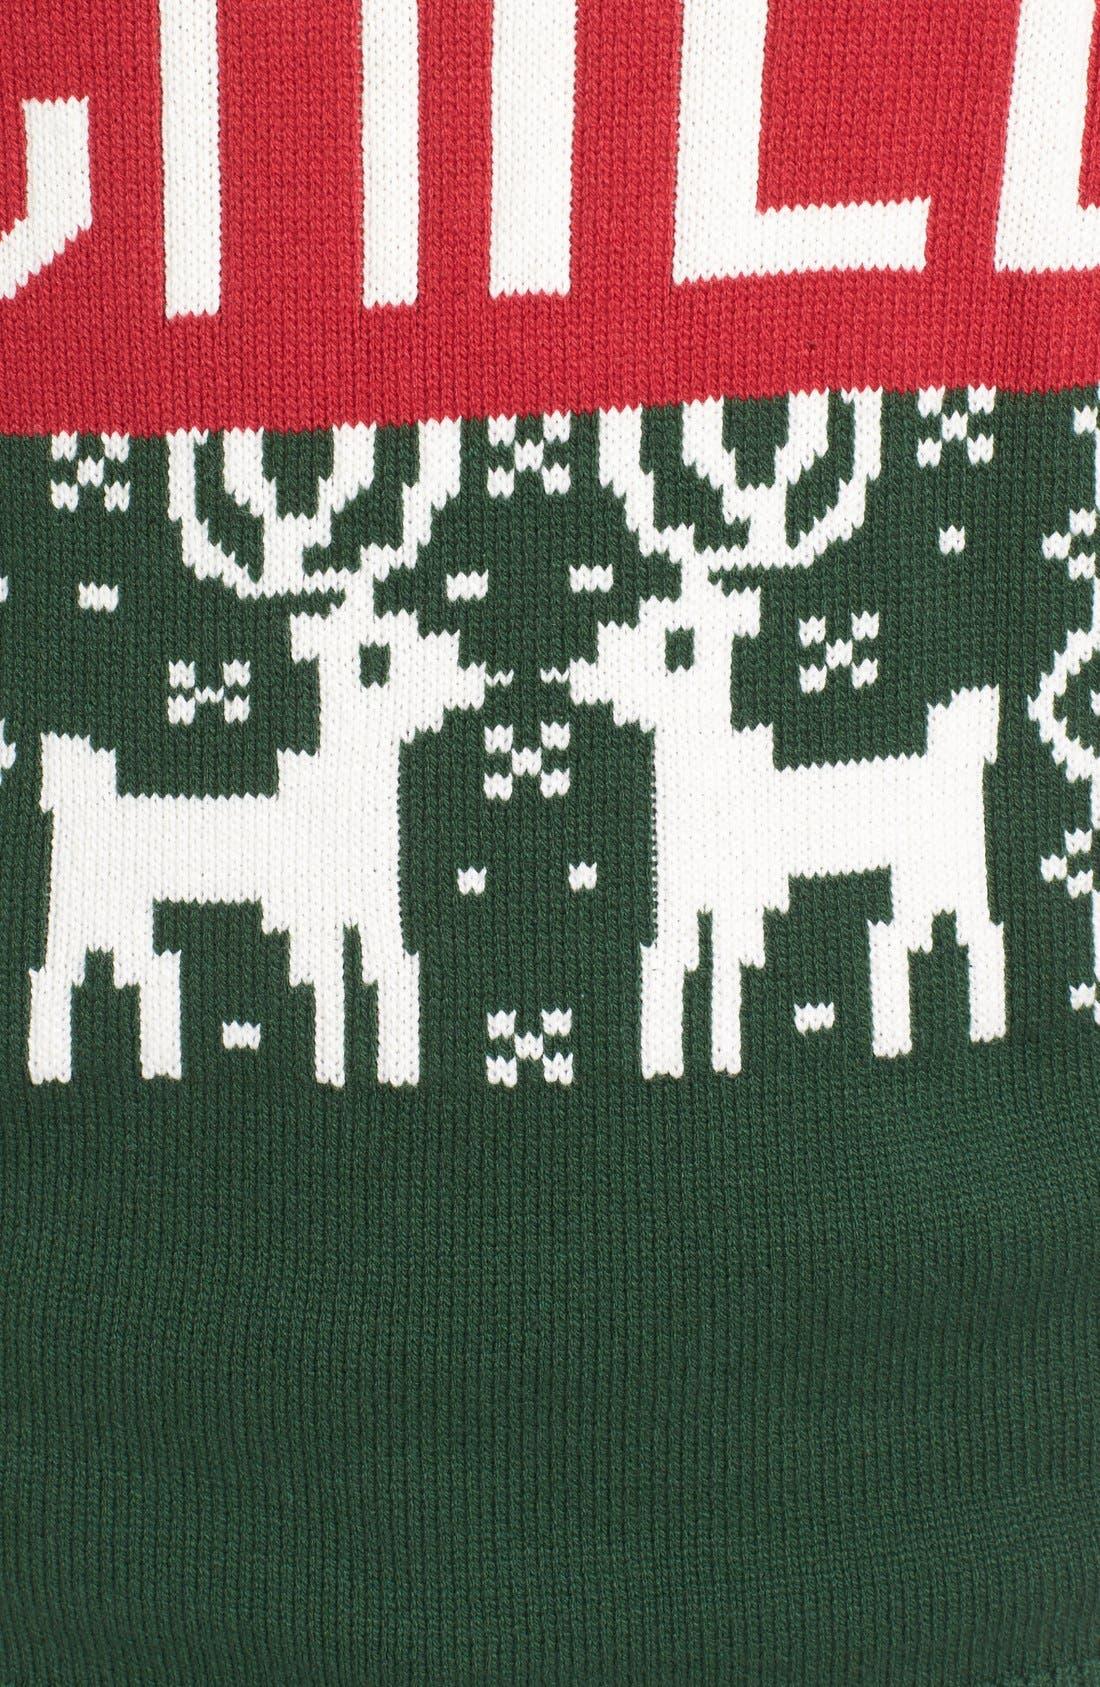 'Chill Vibes' Intarsia Crewneck Sweater,                             Alternate thumbnail 5, color,                             641